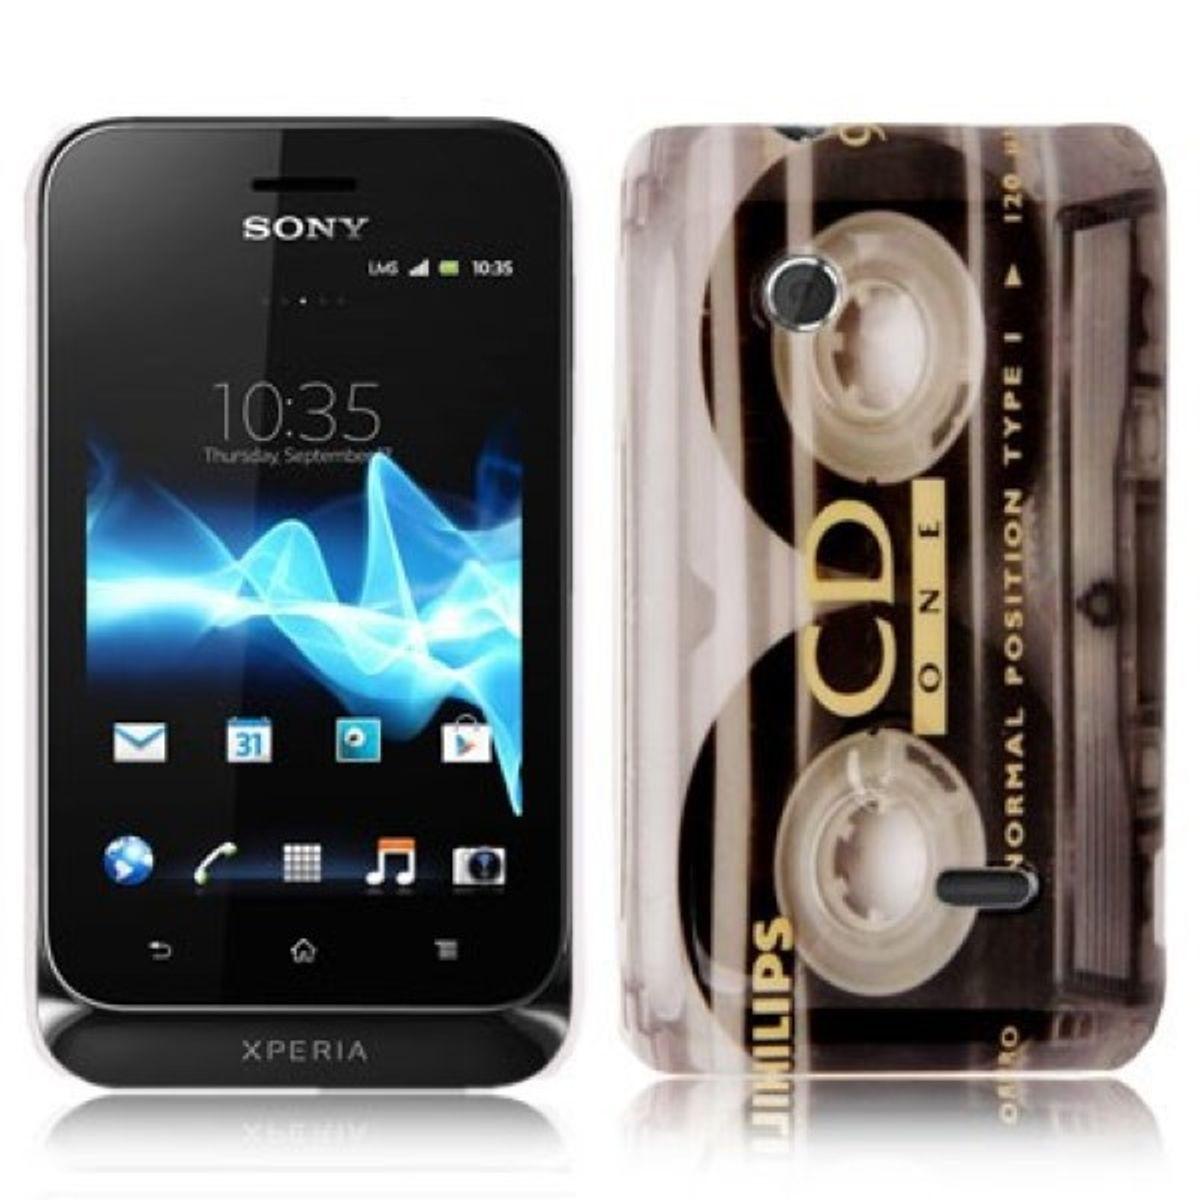 Hard Case Hülle Retro Kassette für Handy Sony Xperia Tipo Dual ST21i